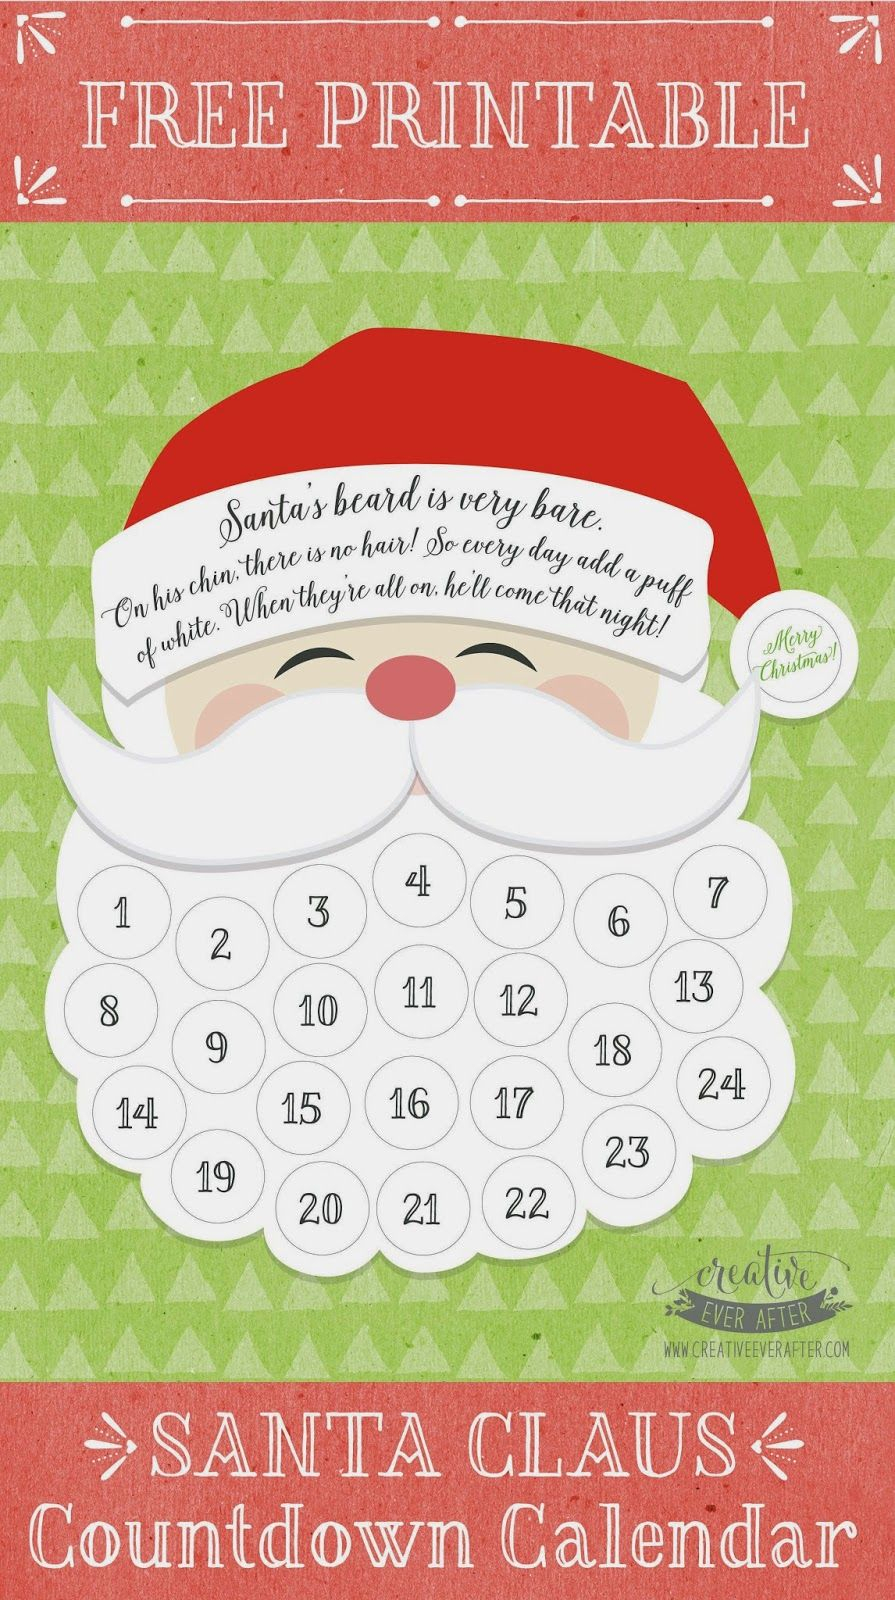 Free Printable} Santa Claus Beard Countdown Calendar with Make A Countdown Calendar Printable